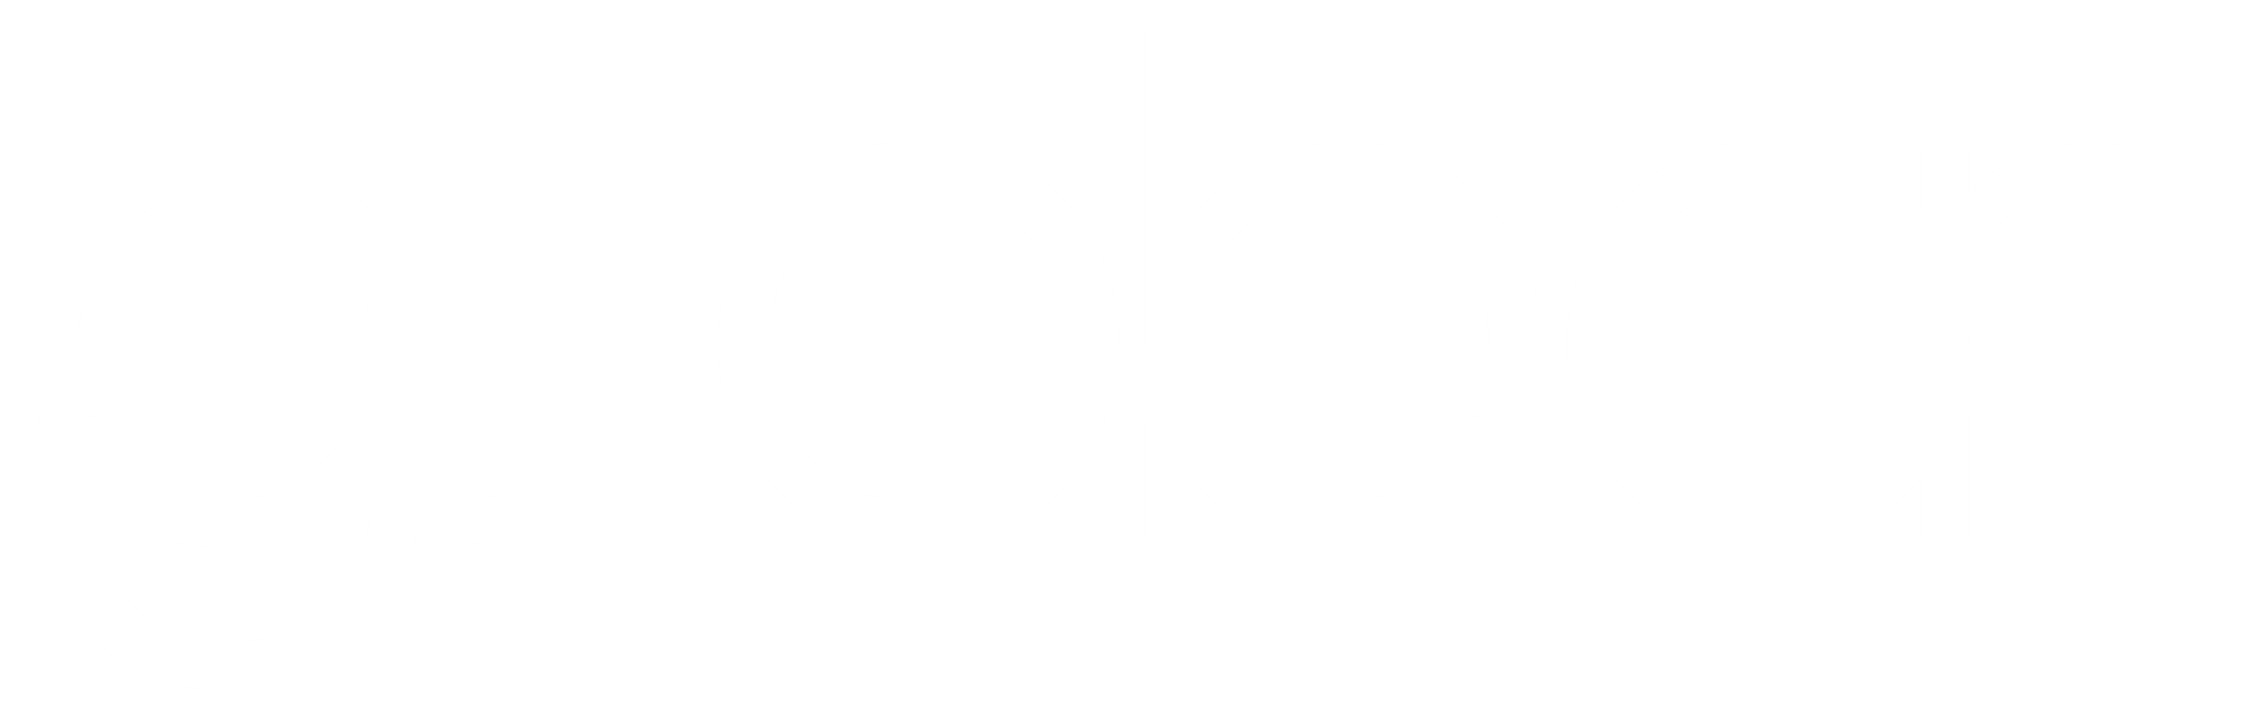 GueBen Diseño Creativo – Javier Guerrero Benavente